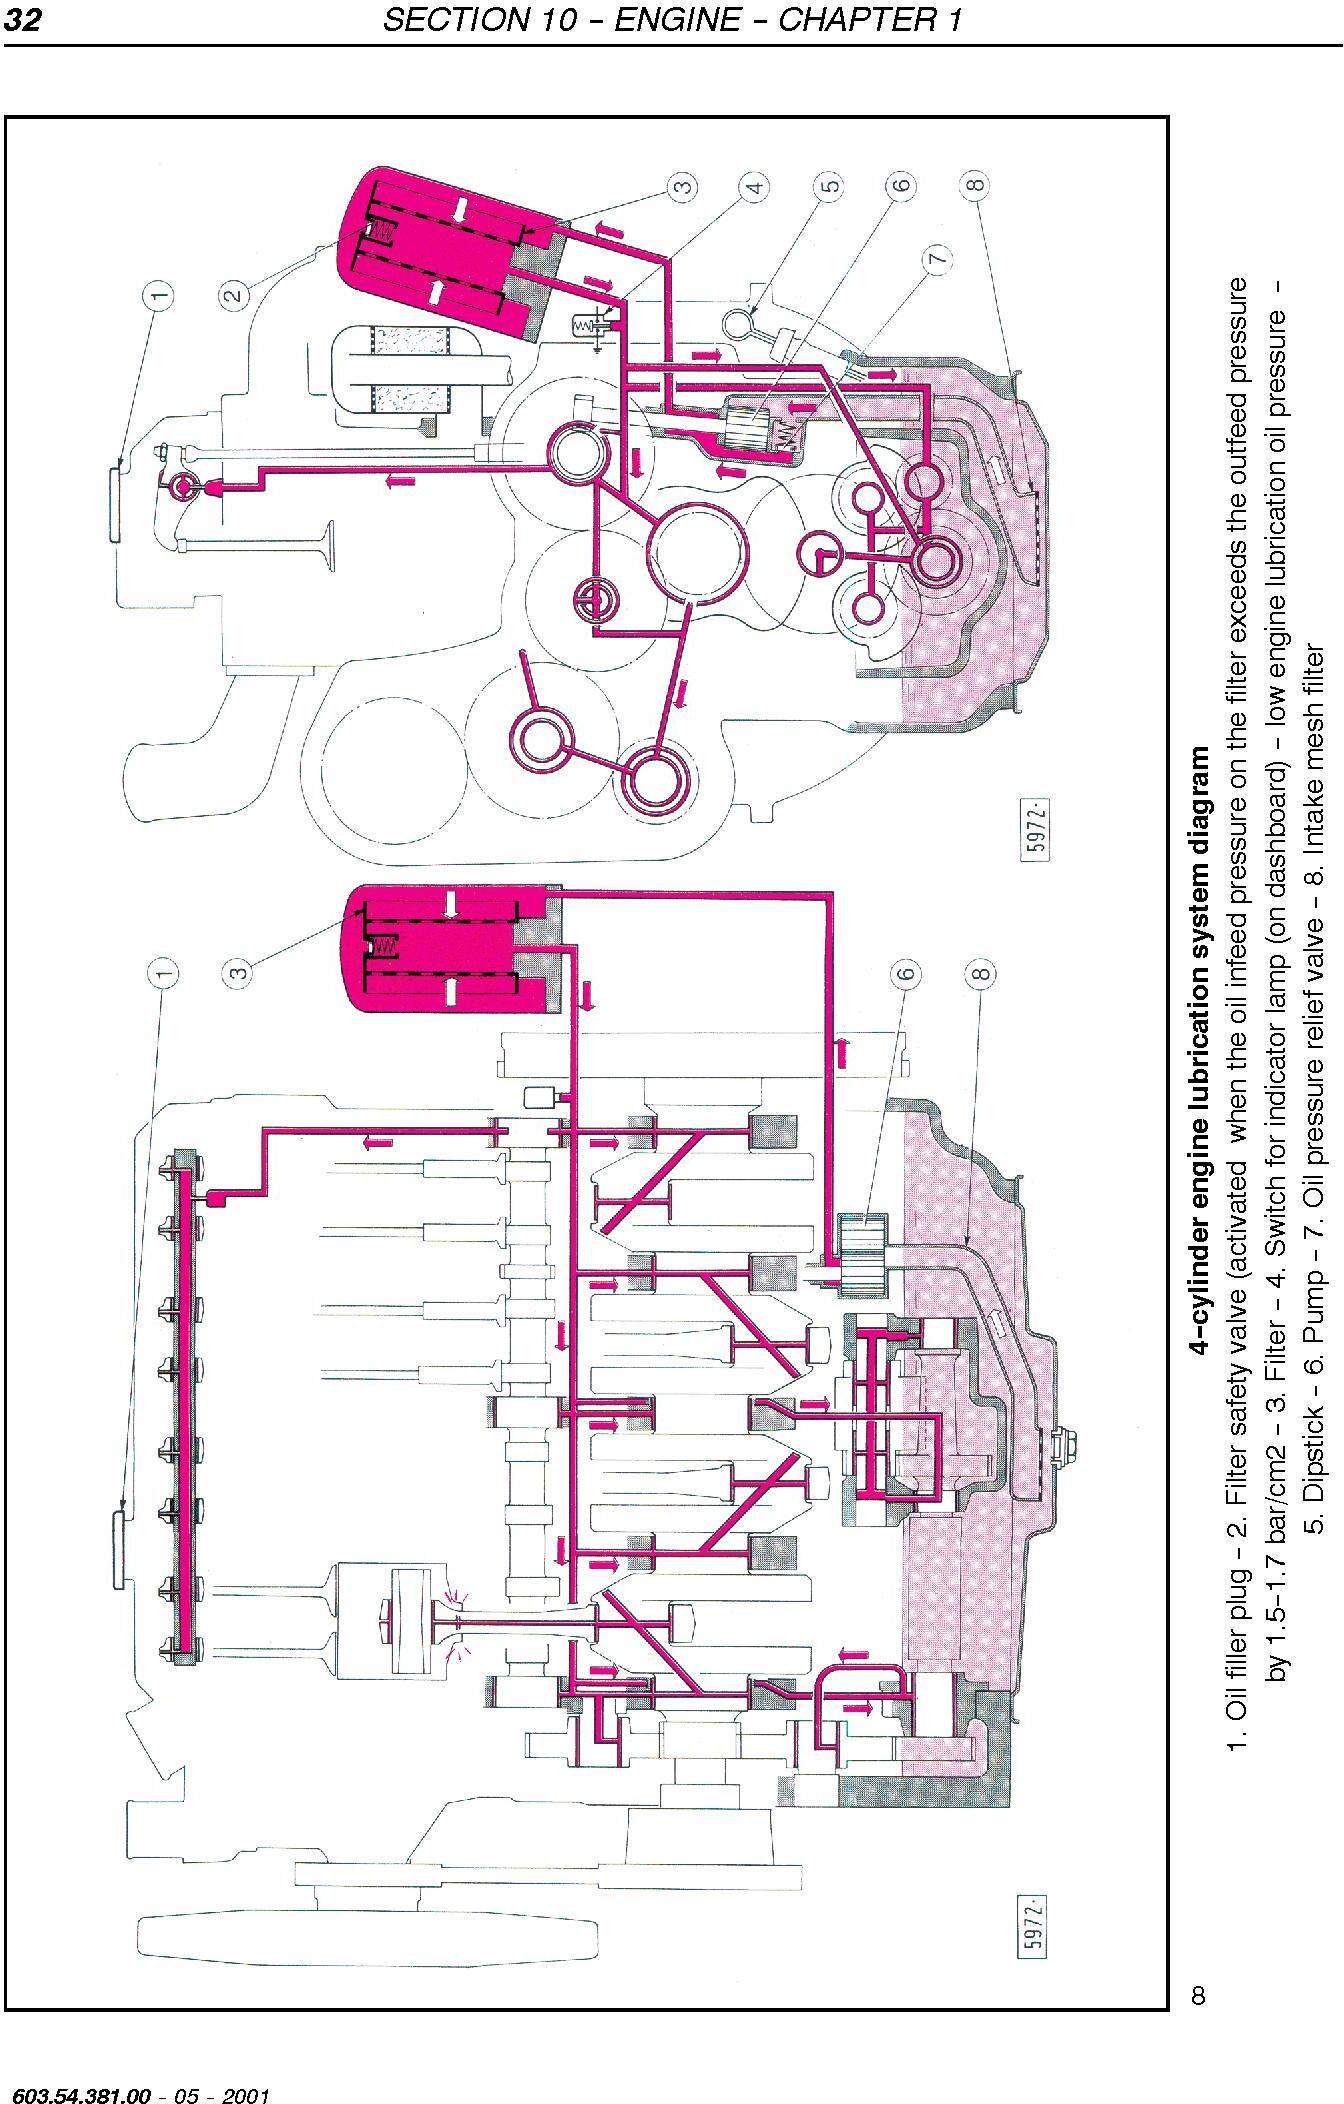 New Holland TK65, TK75(A),TK76, TK85,TK95, TK70A,TK80A, TK90A, TK100A Crawler Tractor Service Manual - 2